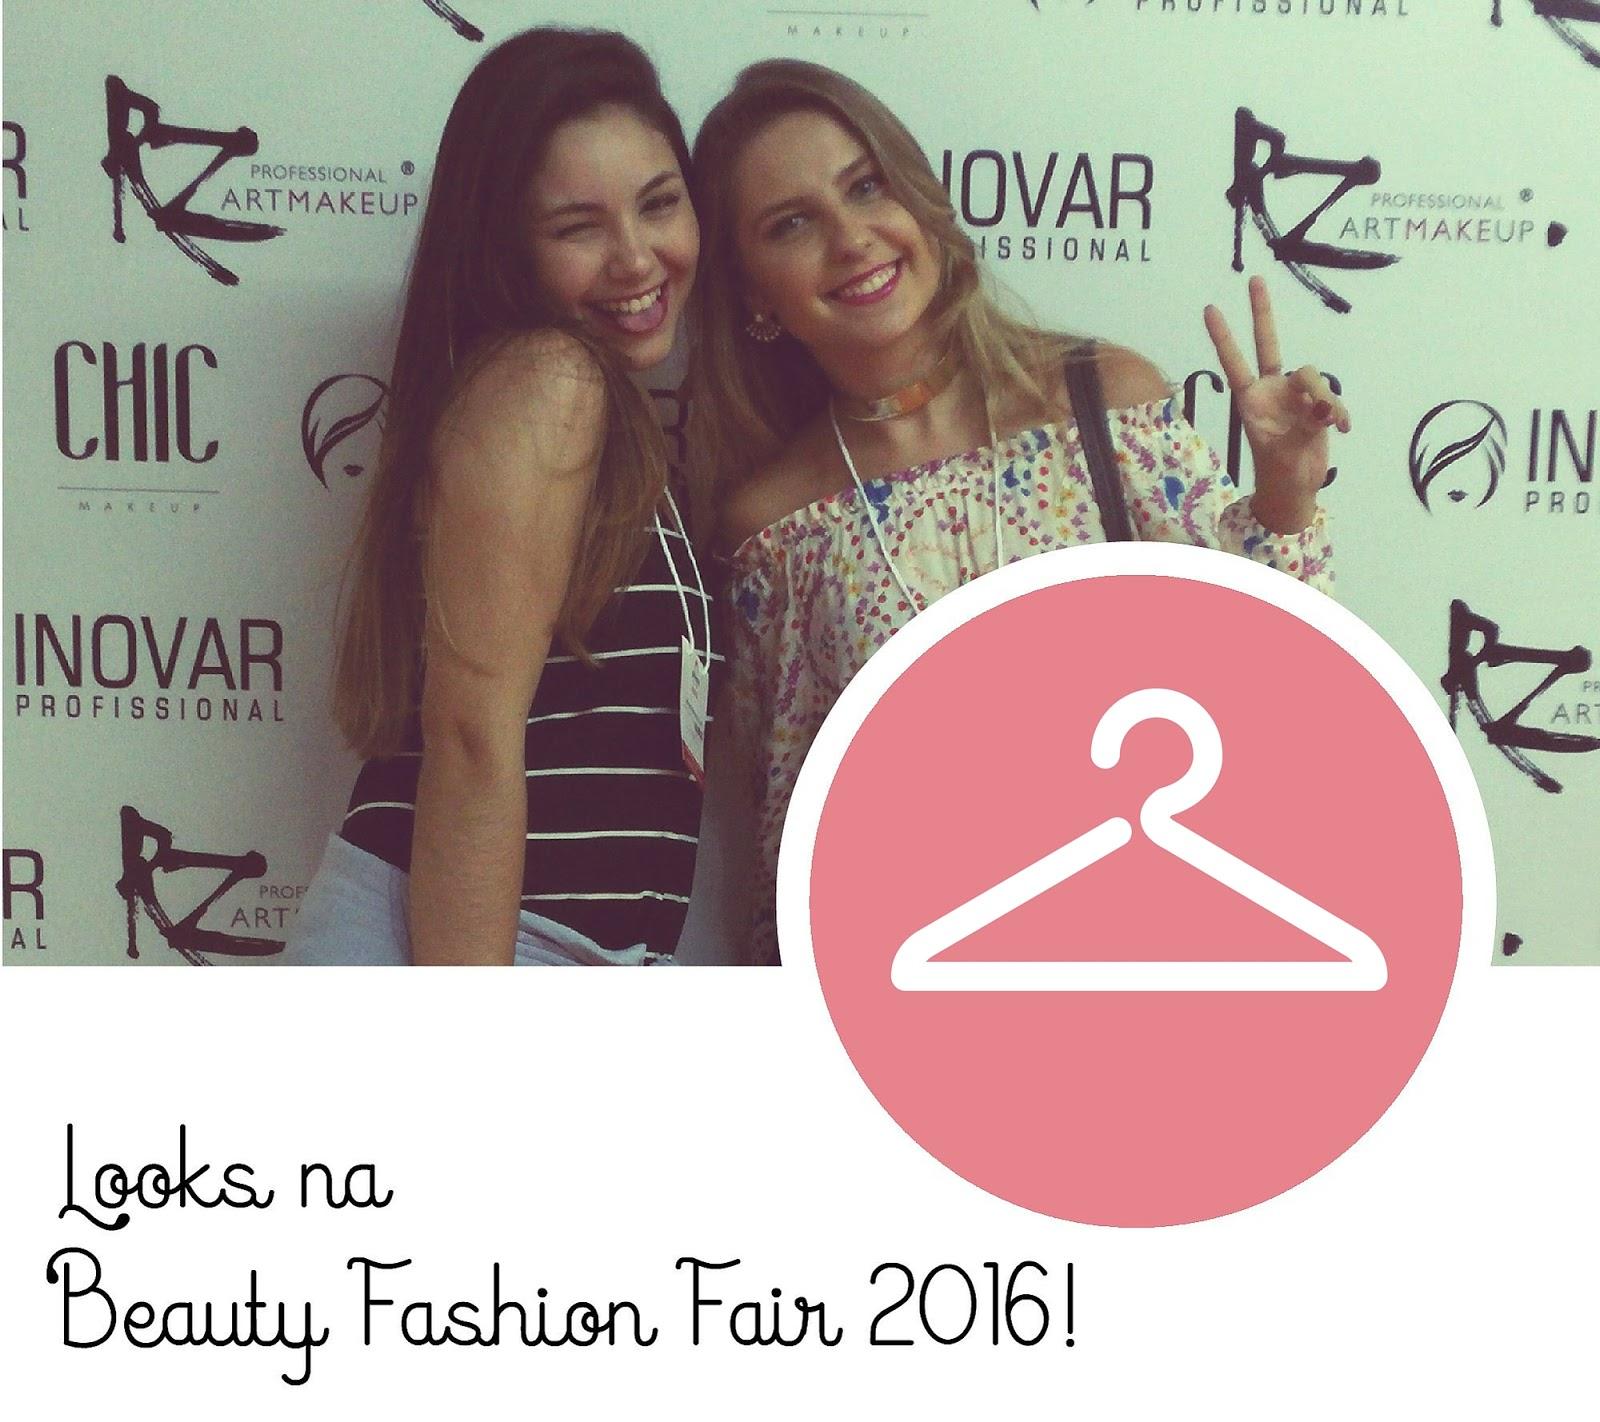 Nossos looks na Beauty Fashion Fair 2016!